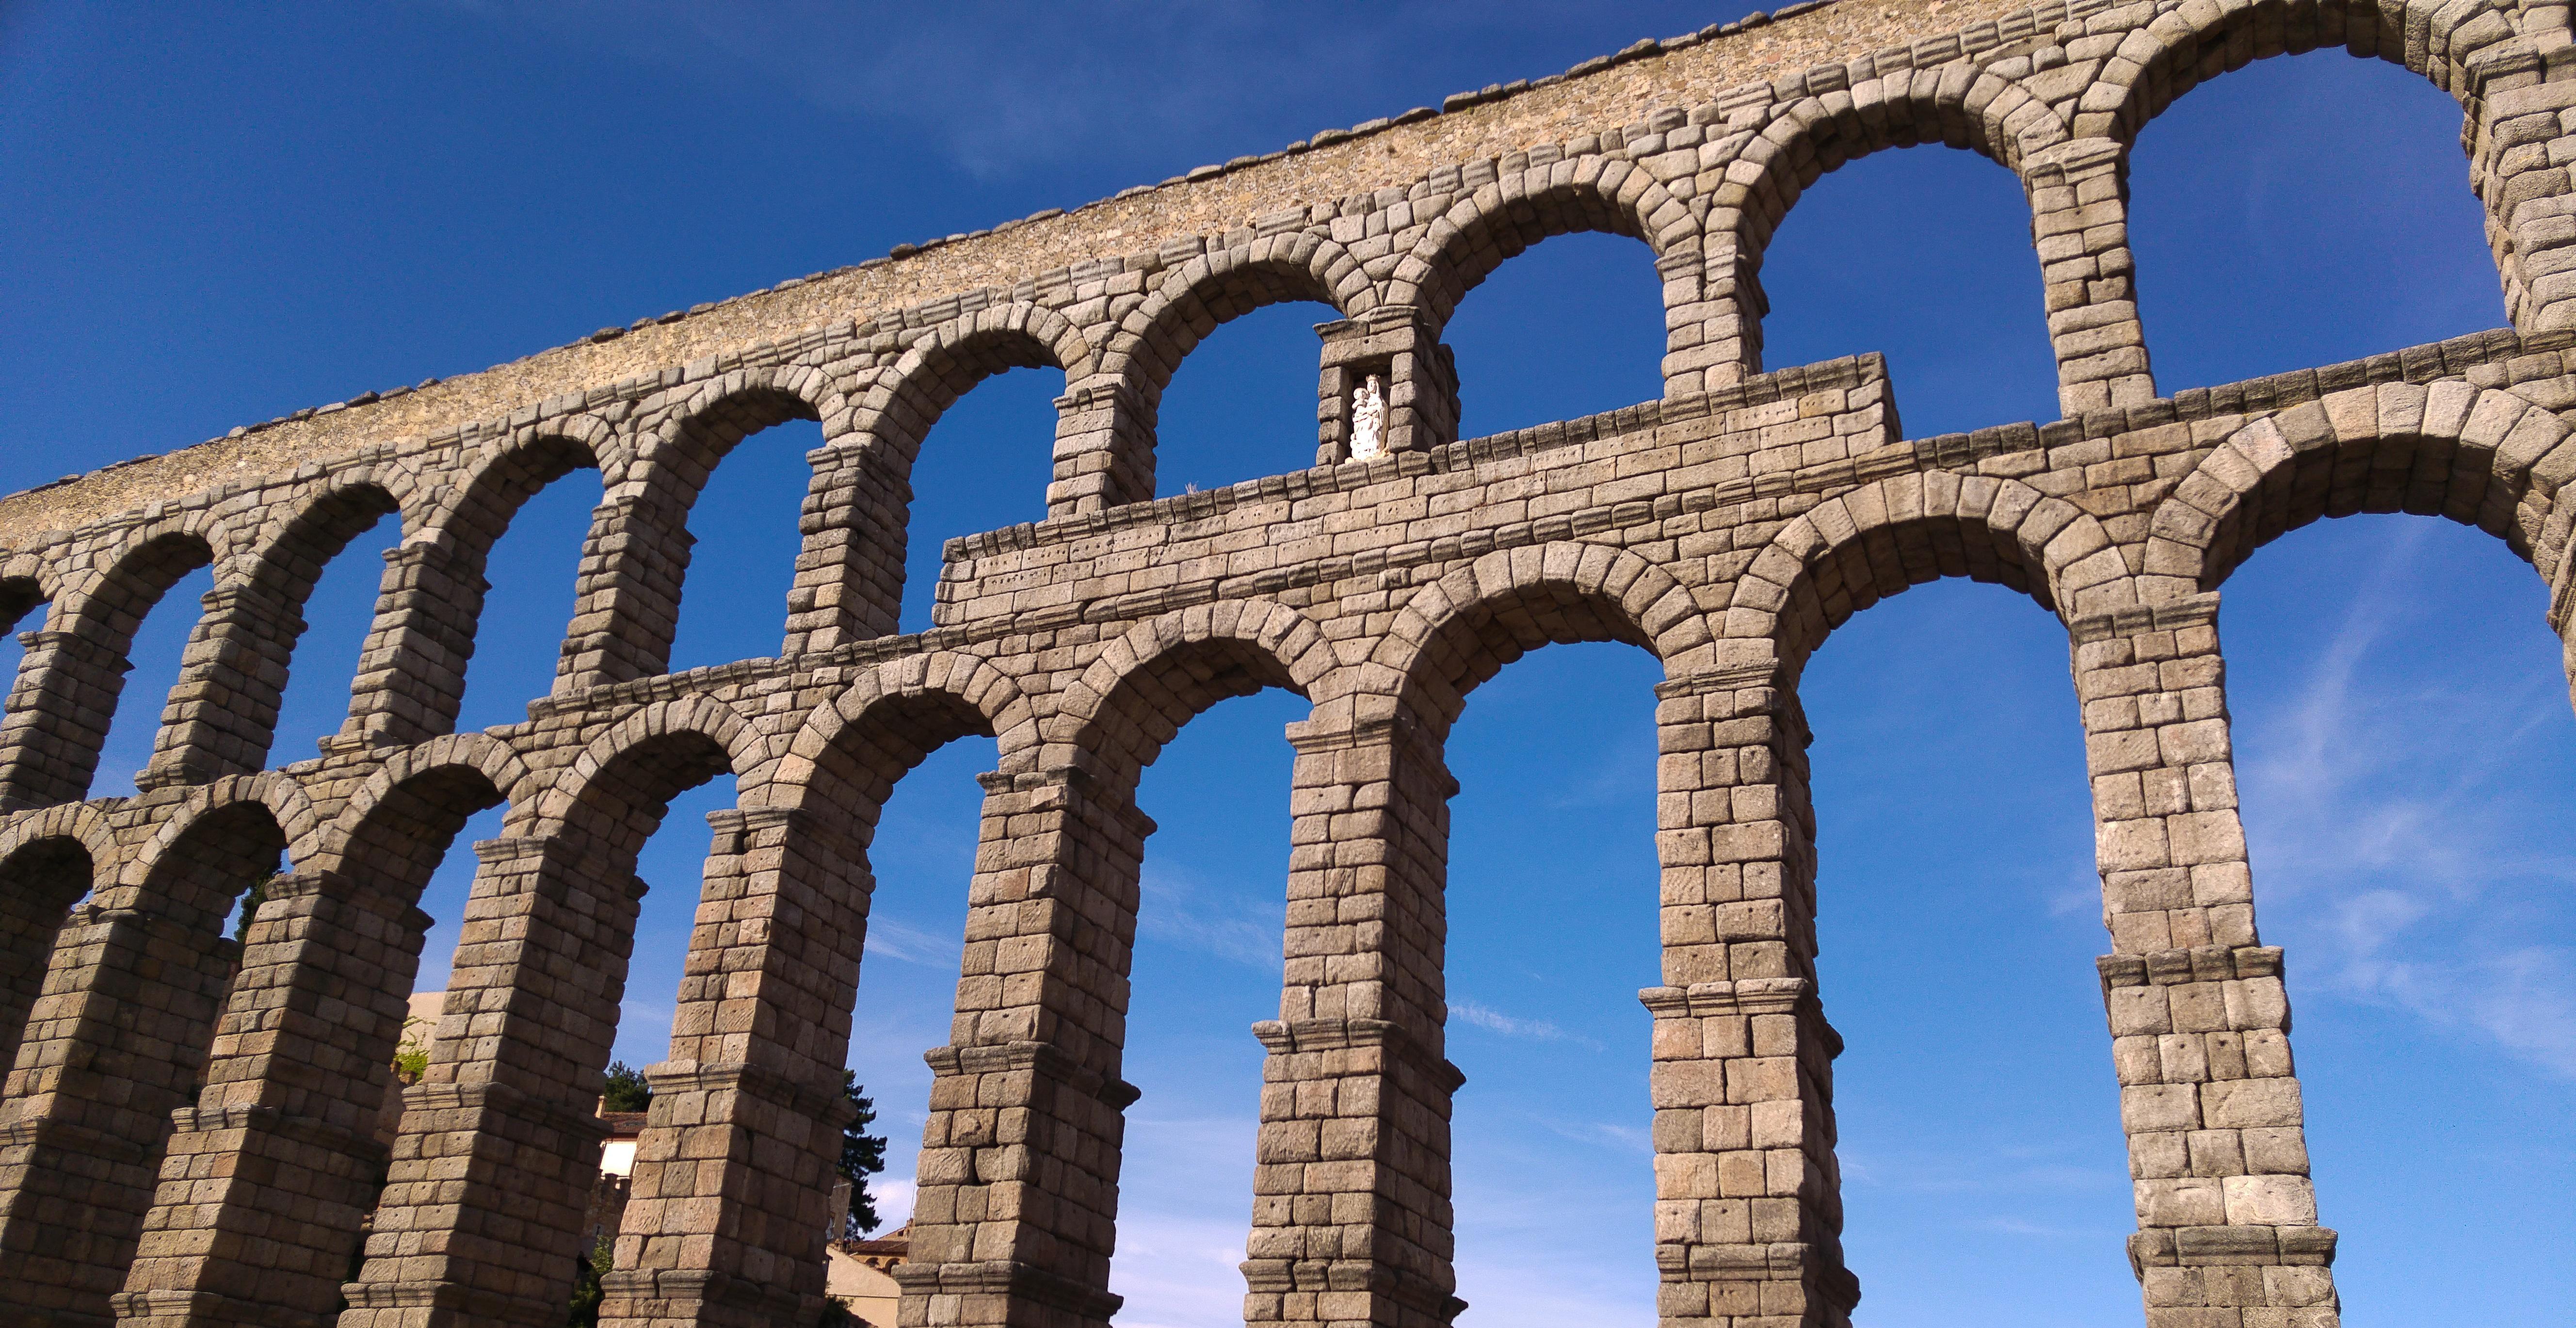 Gratis billeder bro bue milep l spanien segovia viadukt akv dukt buebro - Acueducto de segovia arquitectura ...